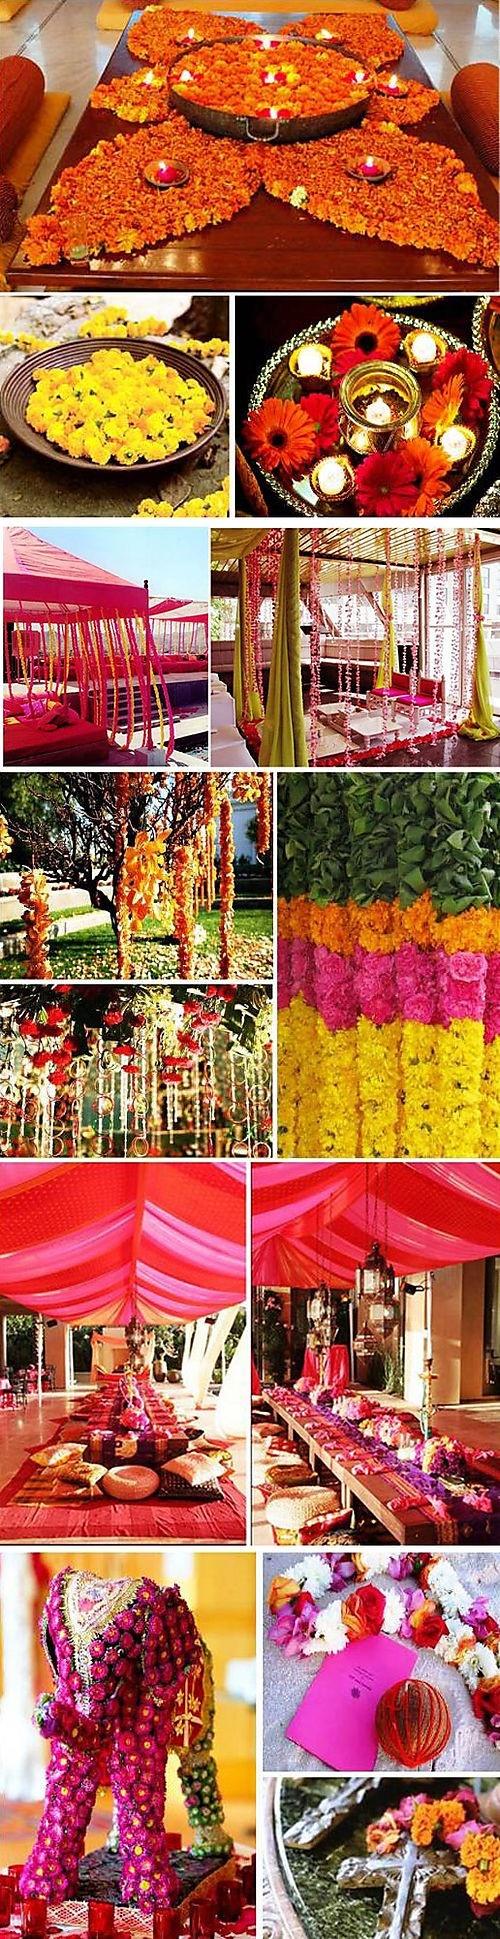 Wedding reception decoration images  Jyoti Jaisingh jyotijaisingh on Pinterest